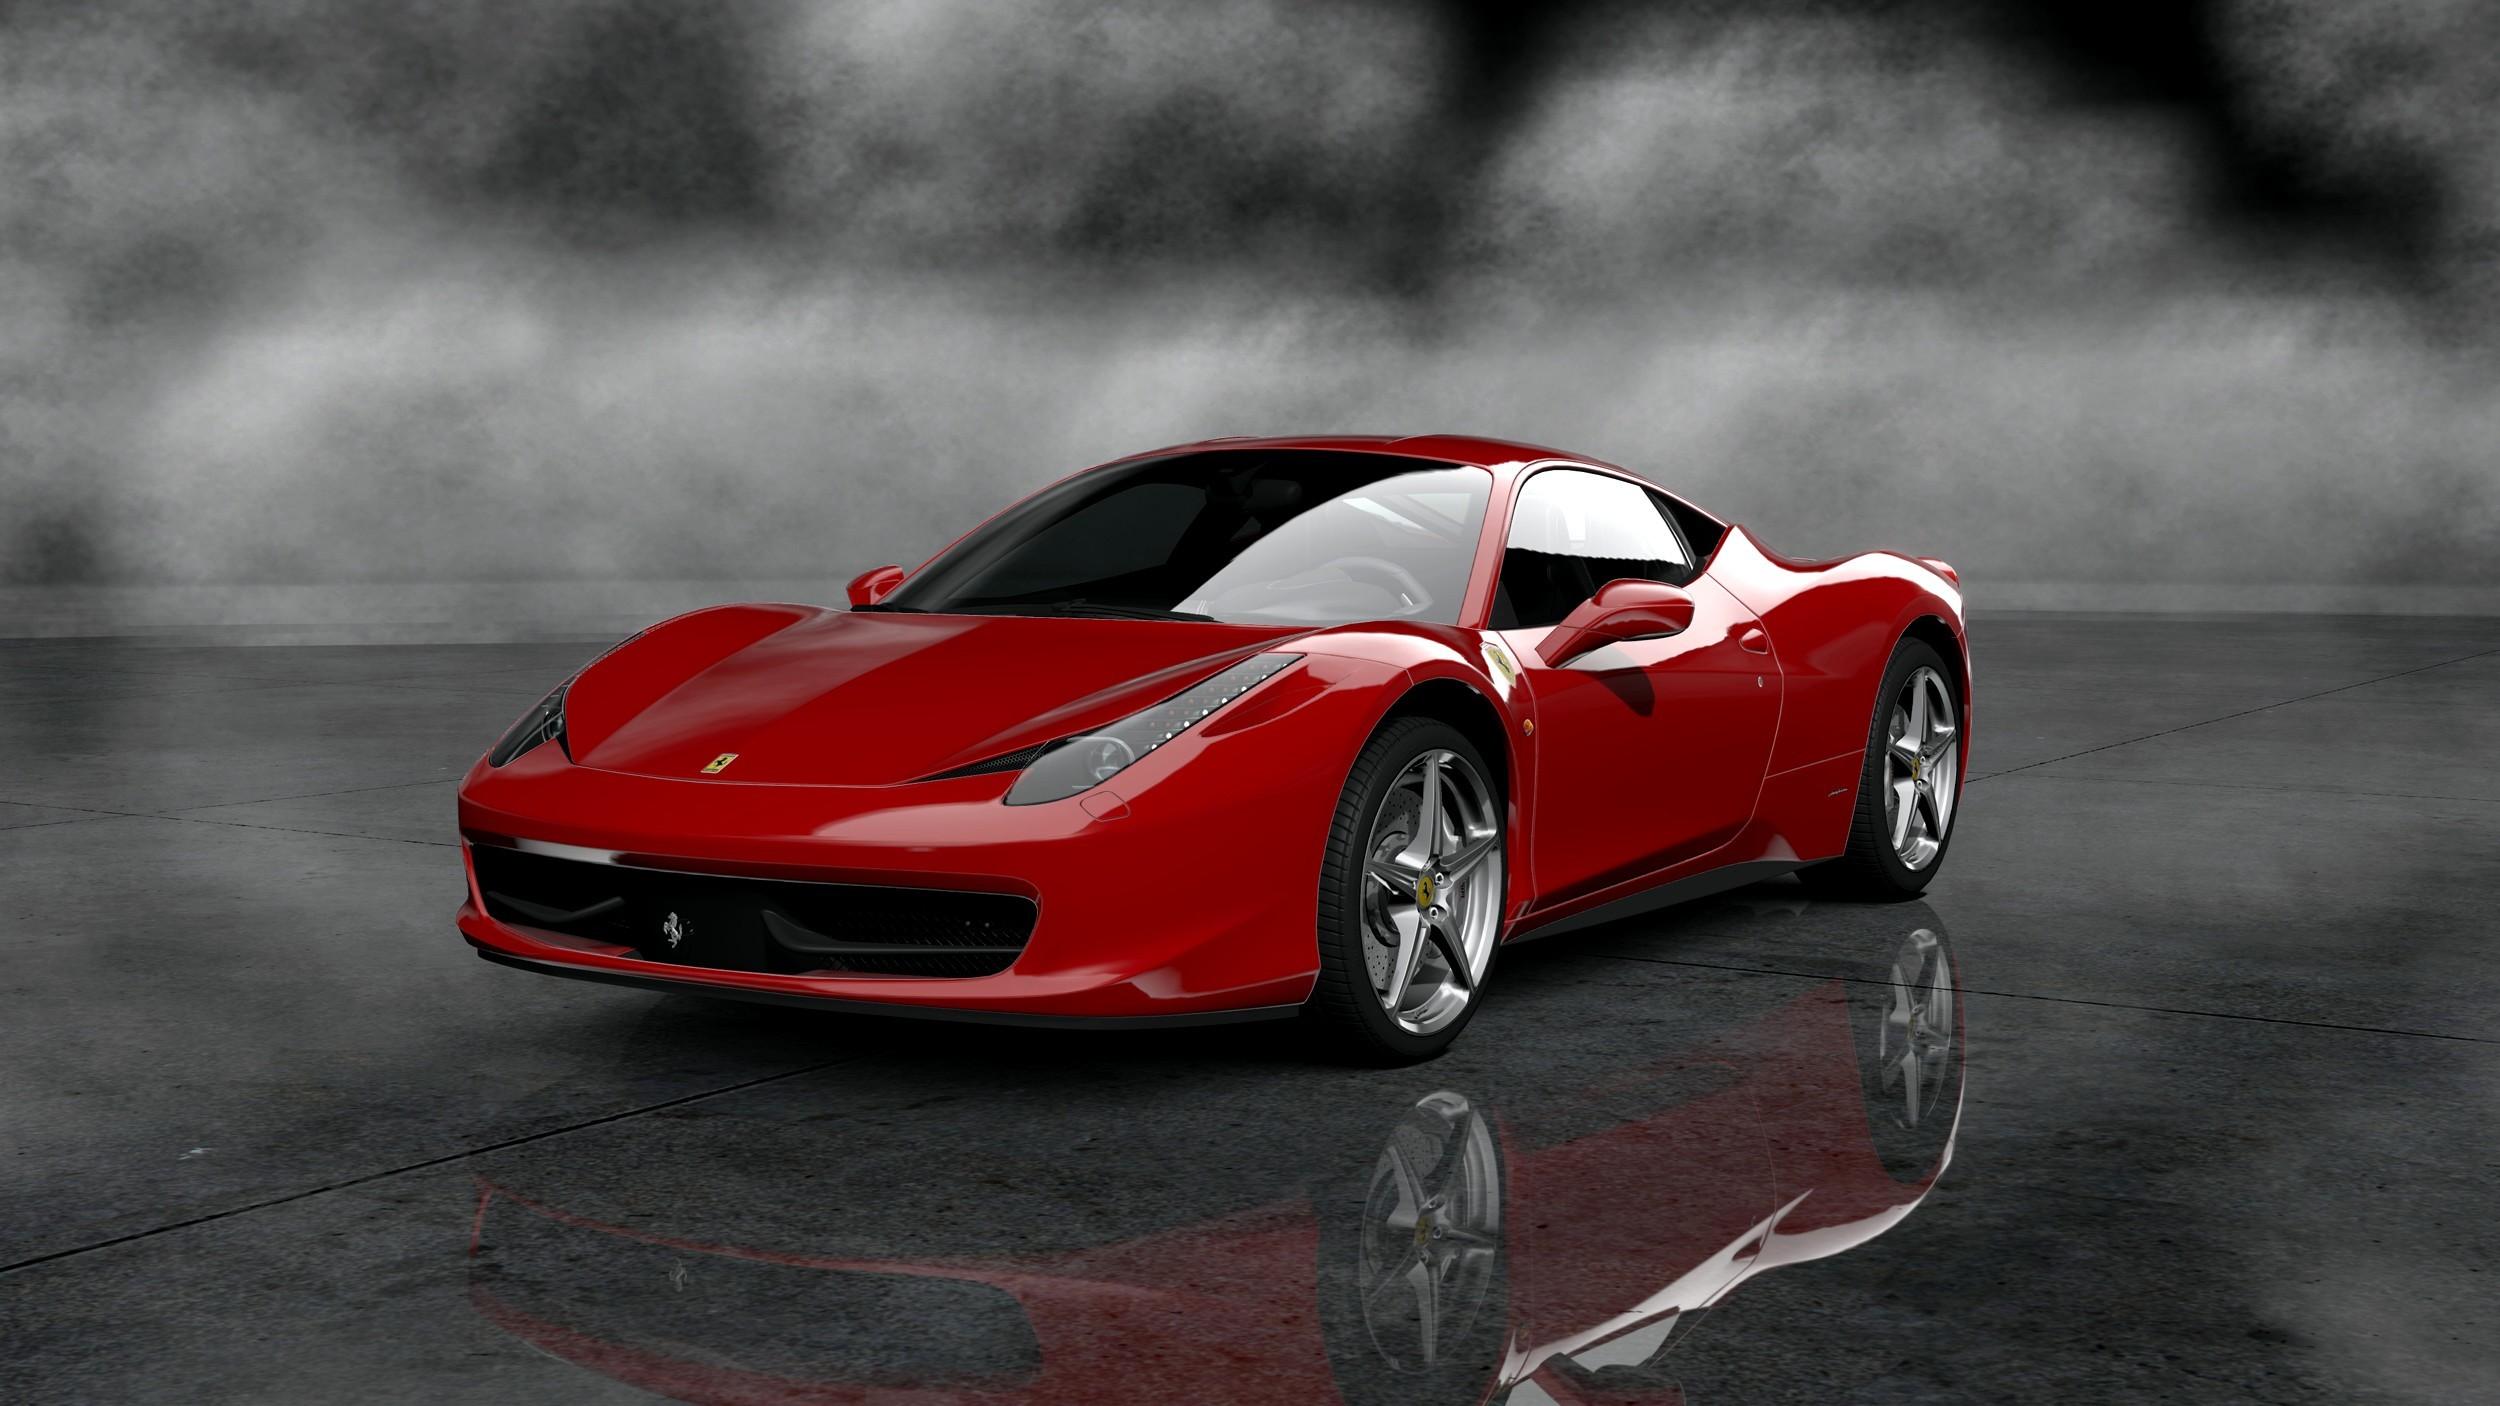 Download Ferrari 458 Drifting Images Wallpaper  PNG